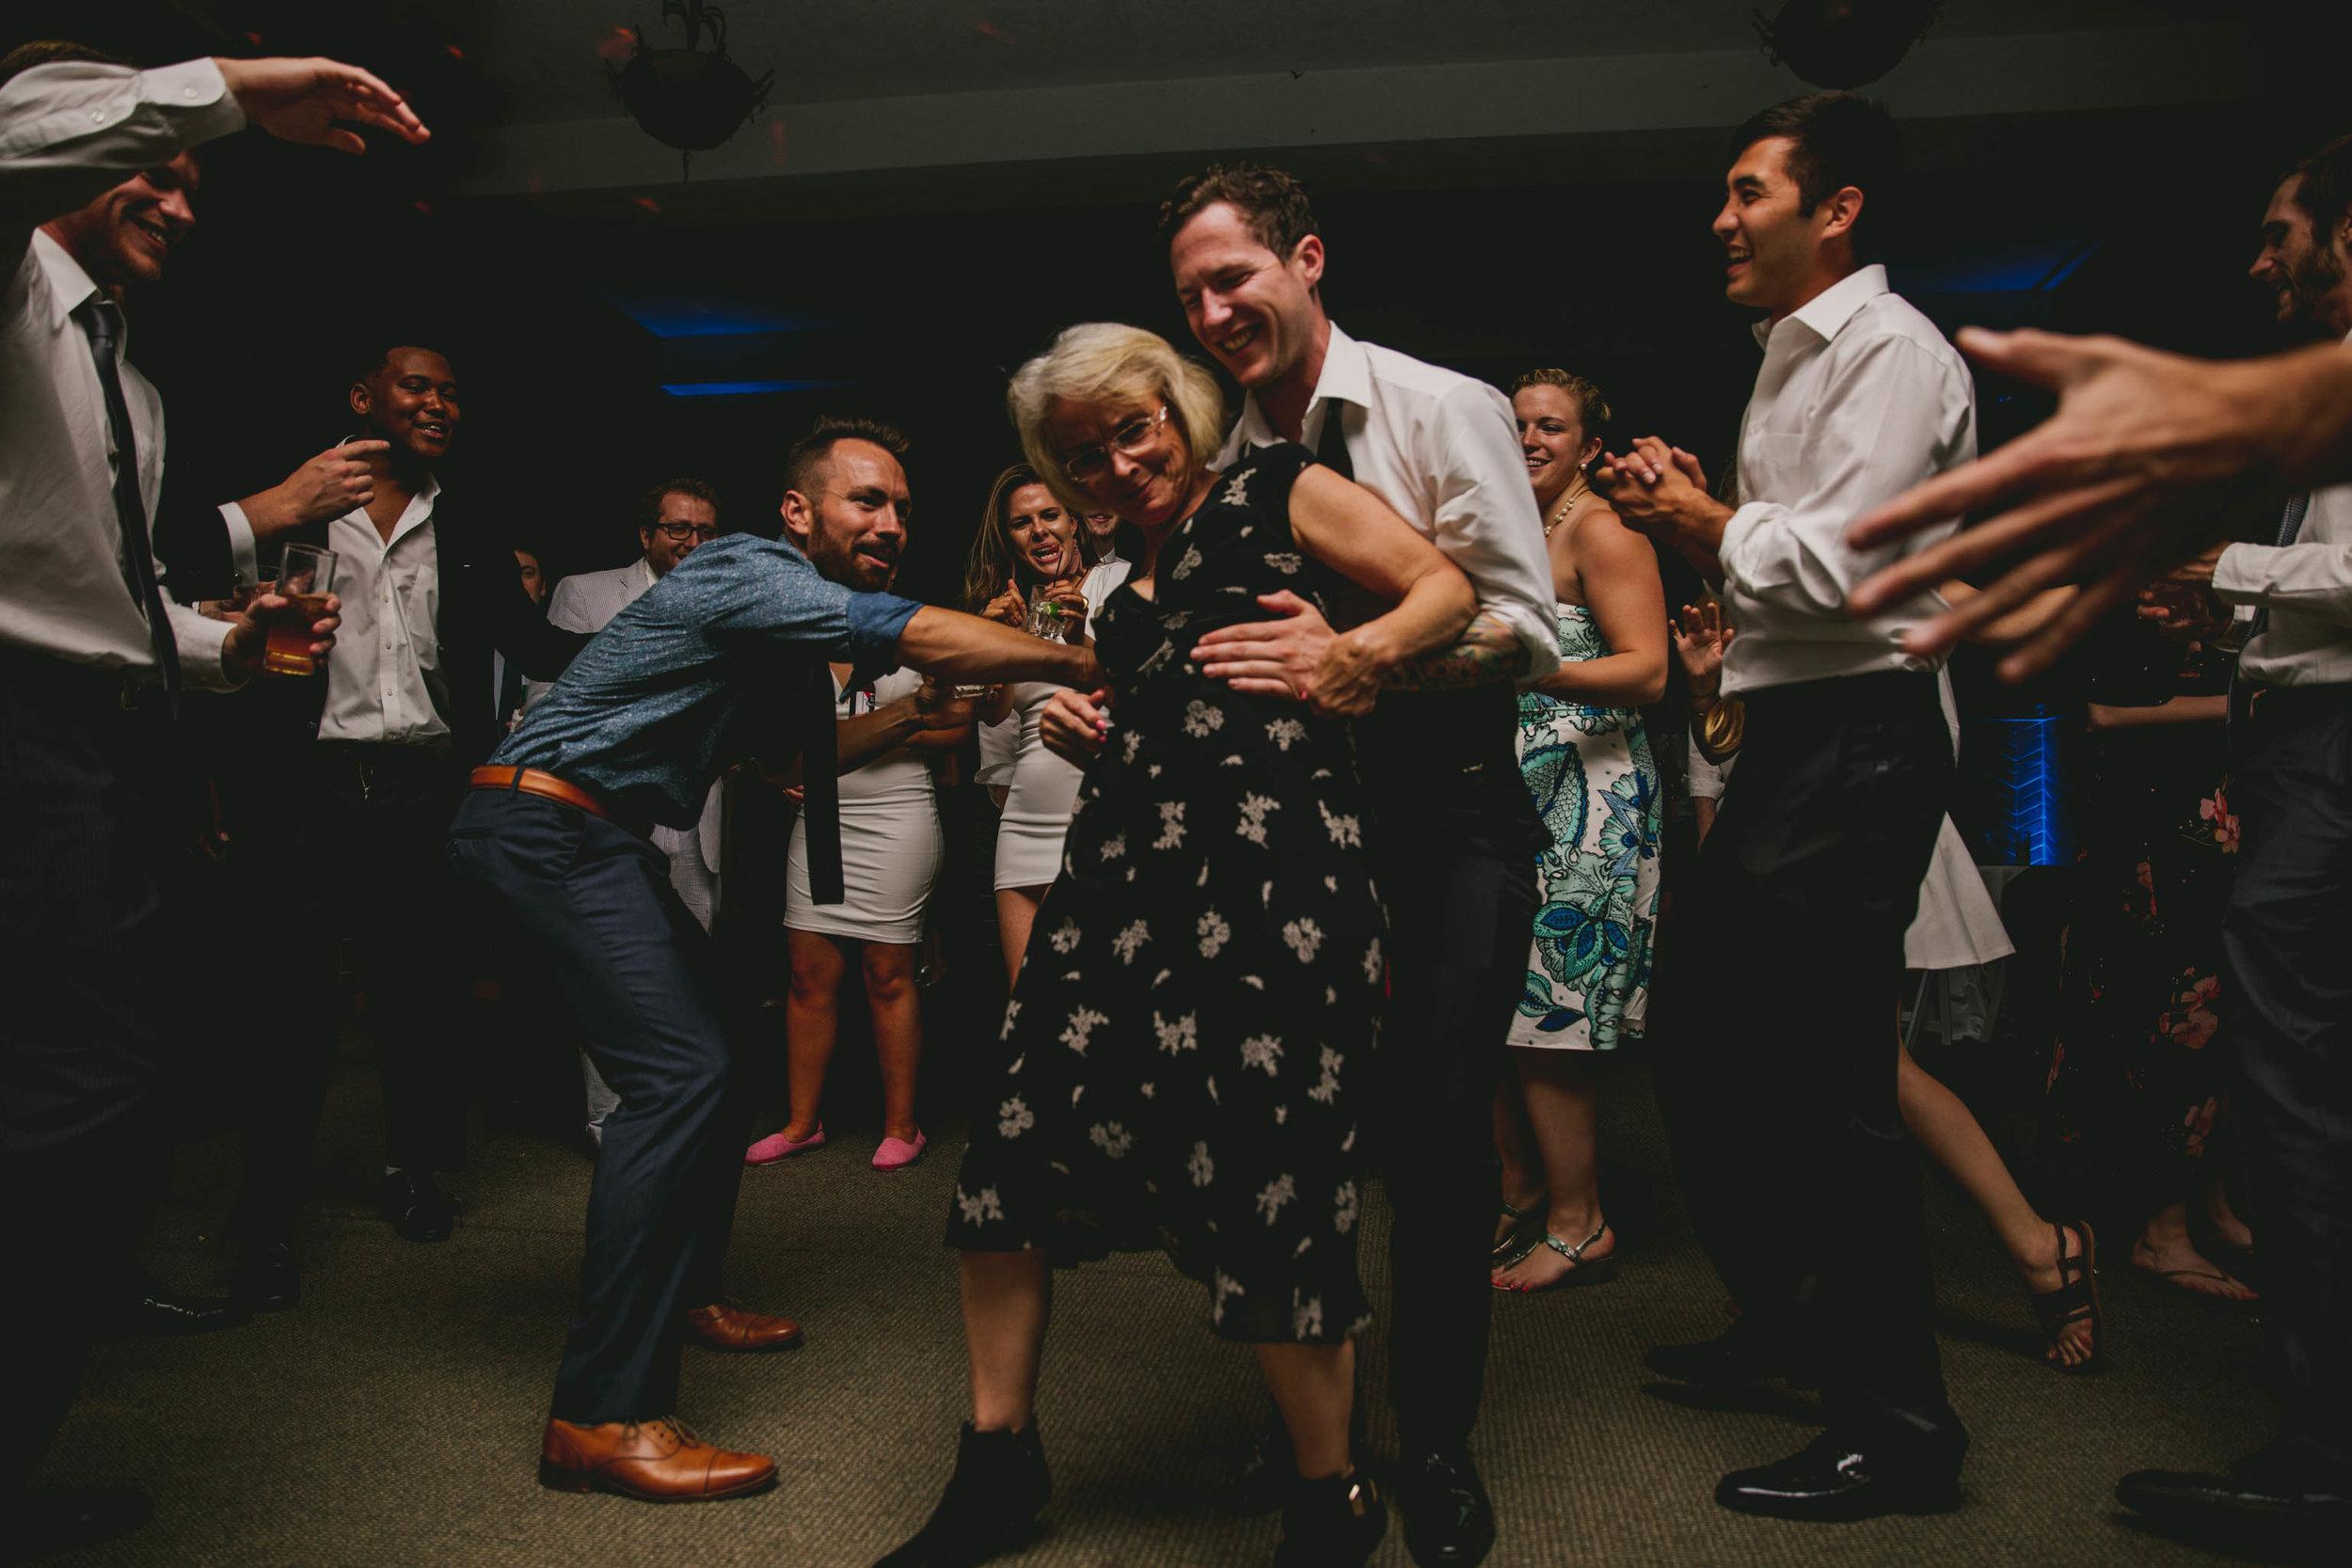 happy-wedding-reception-photo-at-the-graylyn.jpg